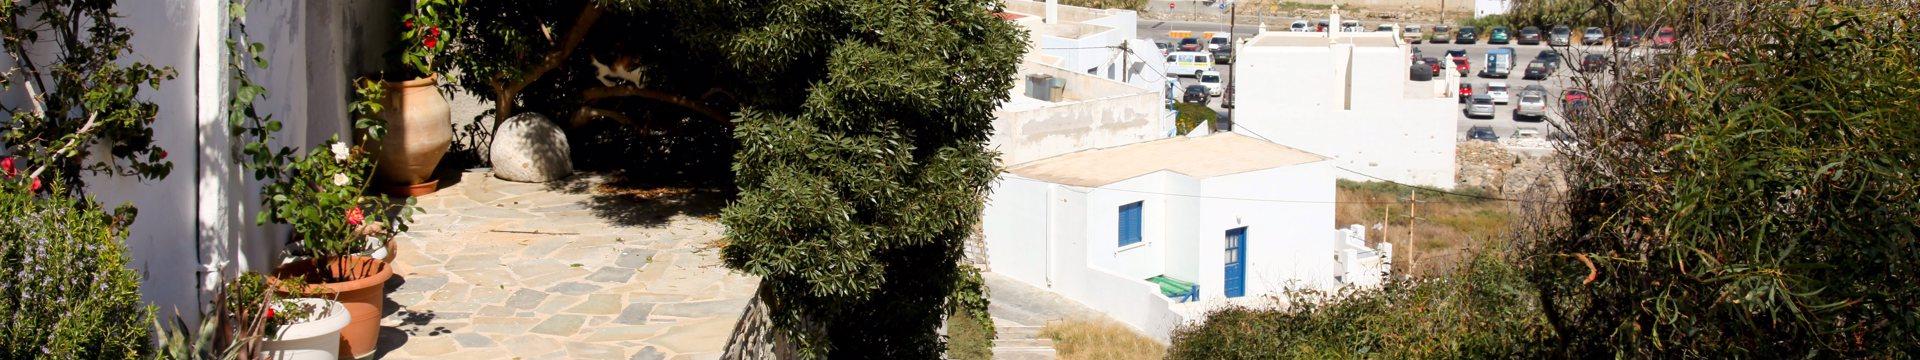 Naxos-stad